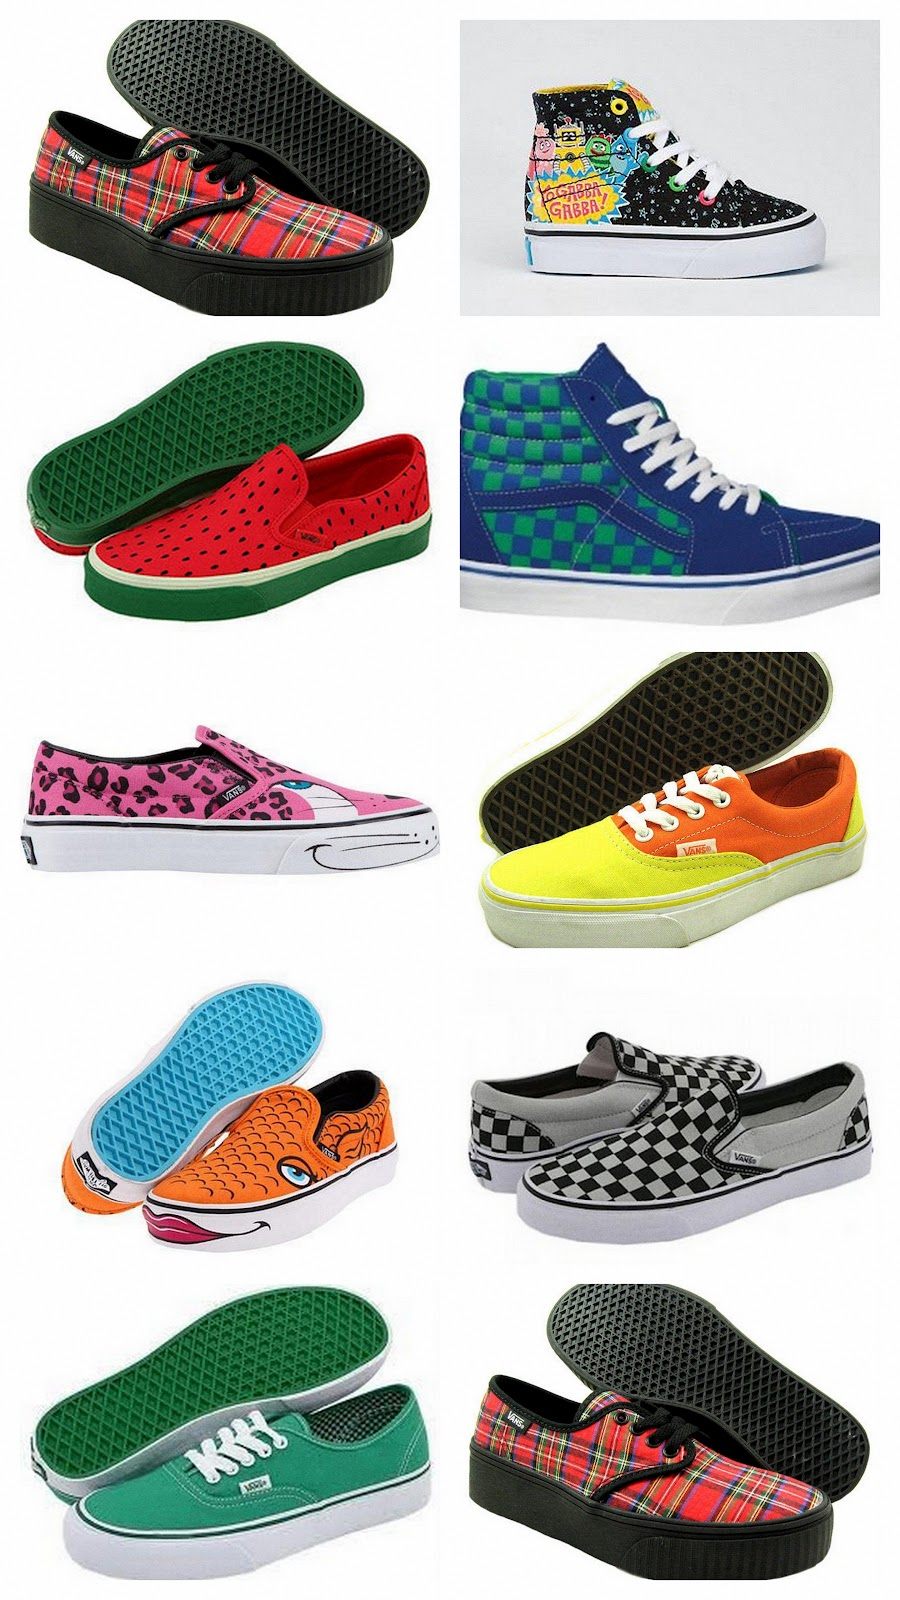 d2a57254d3bc2e Buy vans shoes for wide feet